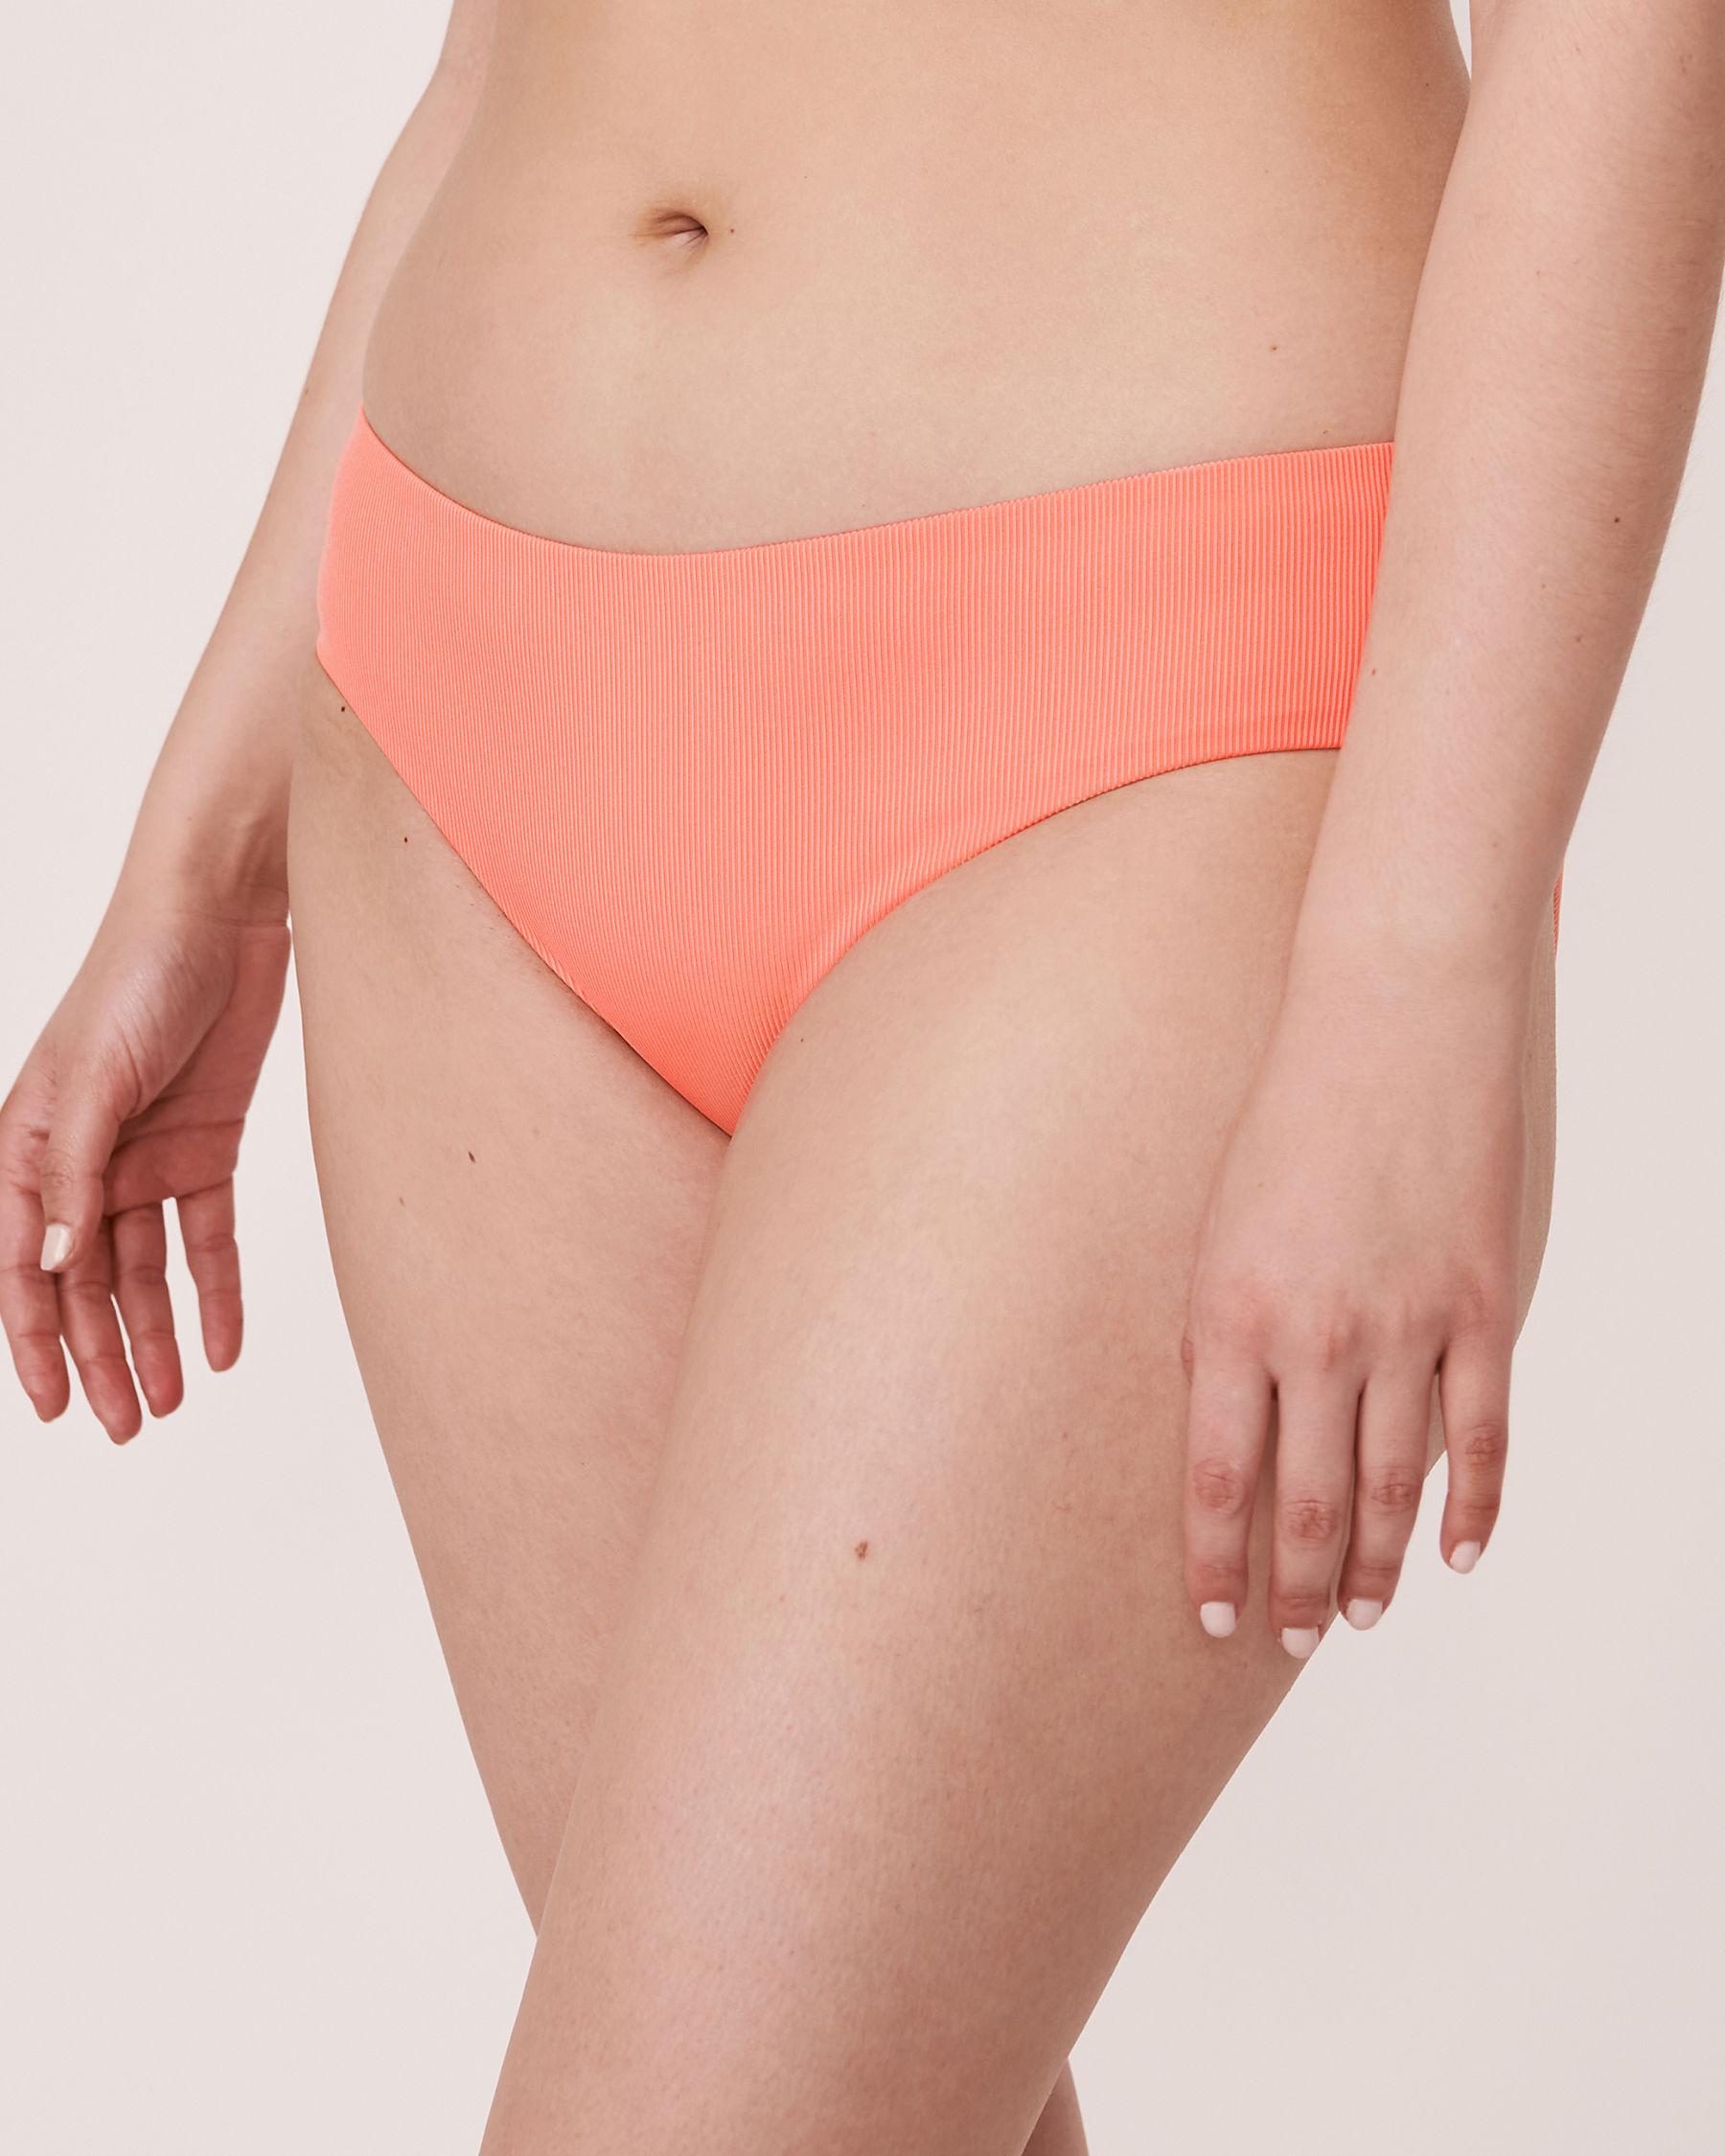 AQUAROSE Bas de bikini hipster en fibres recyclées SOLID RIB Corail 70300051 - Voir1